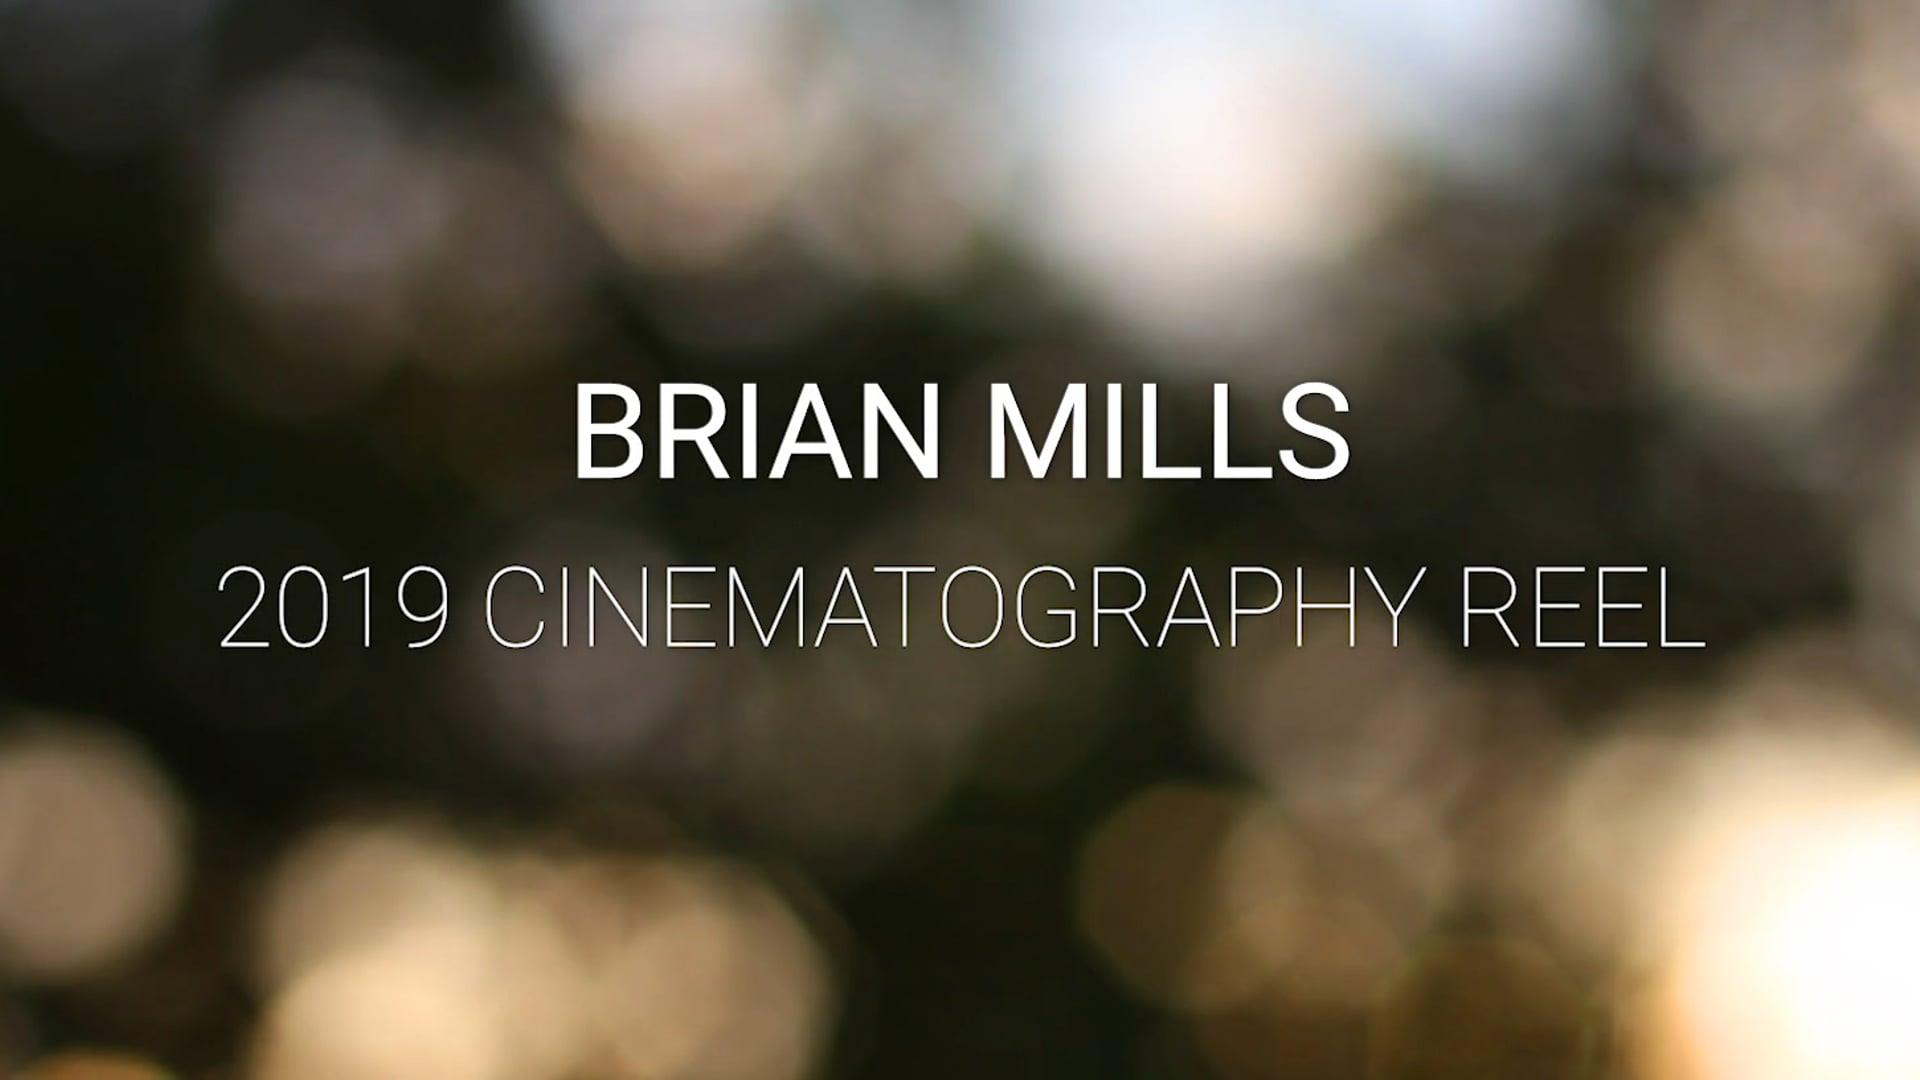 2019 Cinematography Demo Reel